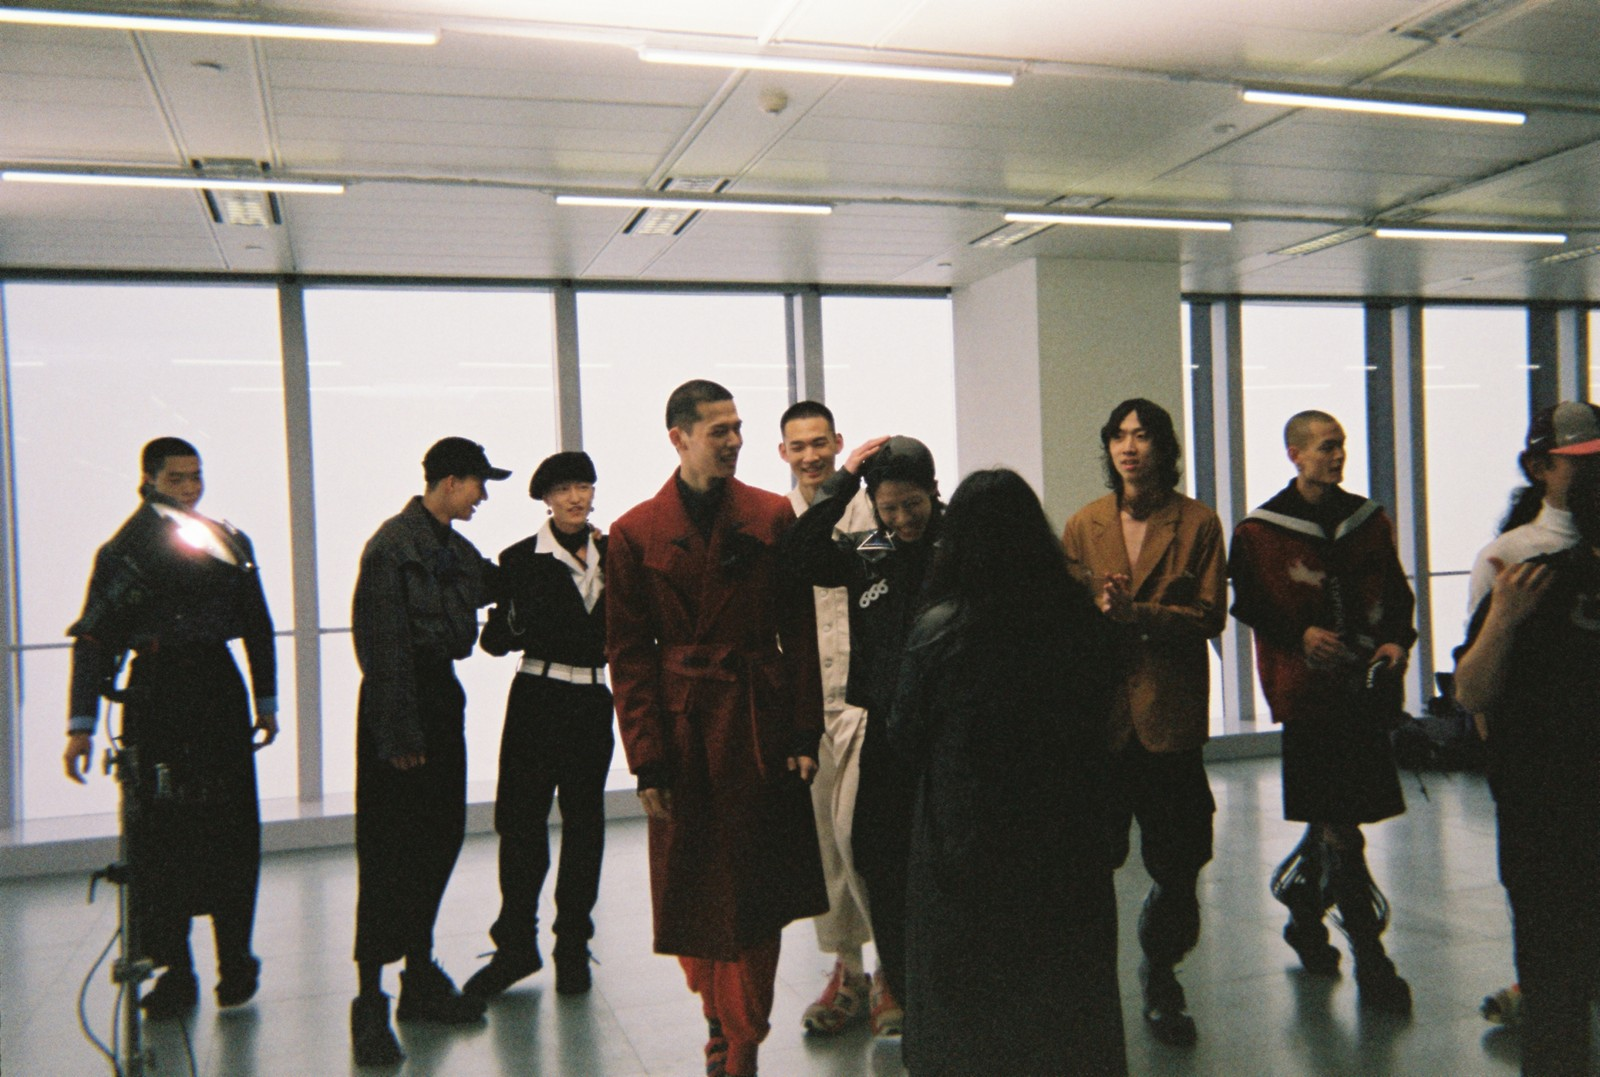 STAFFONLY 镜头下 21AW 的珍贵瞬间,记录一场时装秀的繁复工作与挑战边界的历程